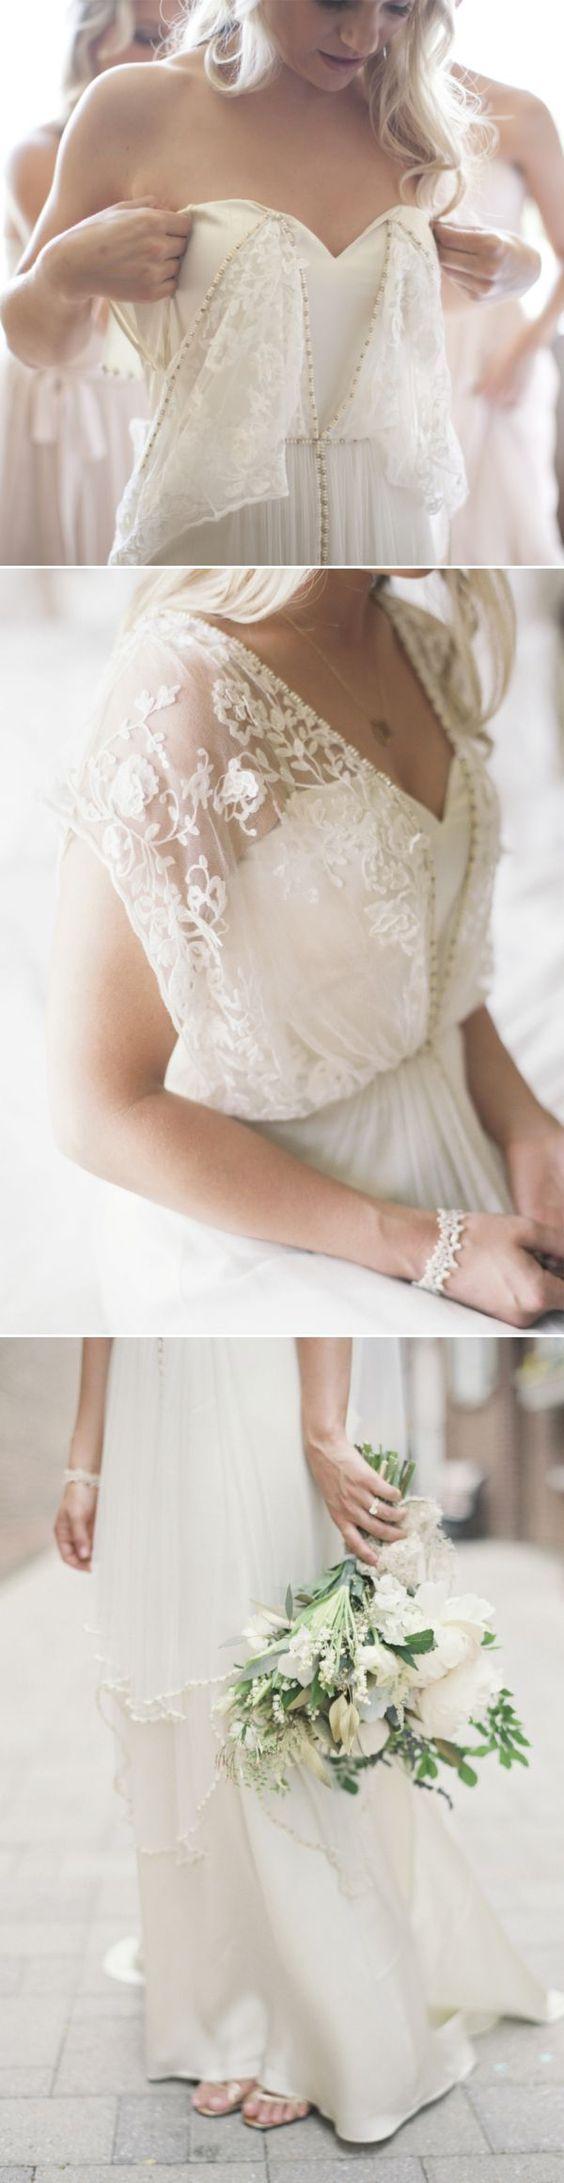 2017 elegant white boho wedding dresses